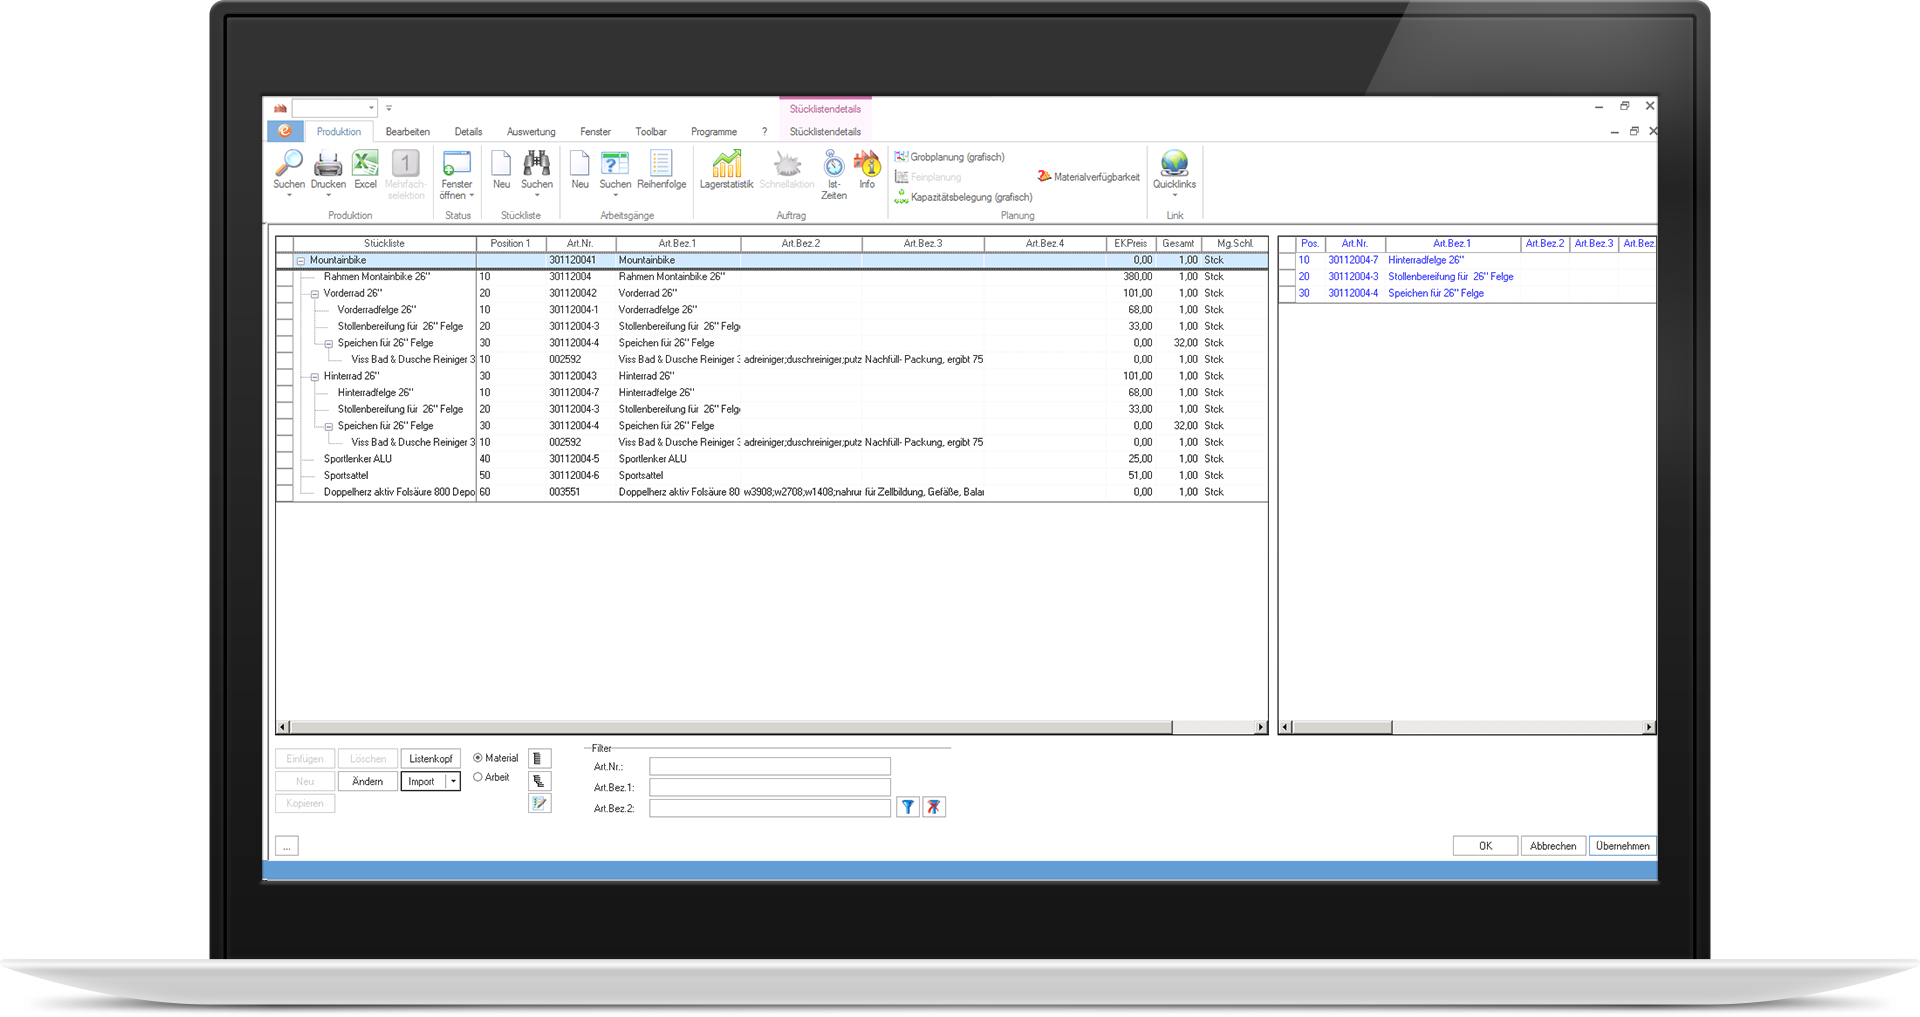 eEvolution_laptop_basis-produktion-stueckliste